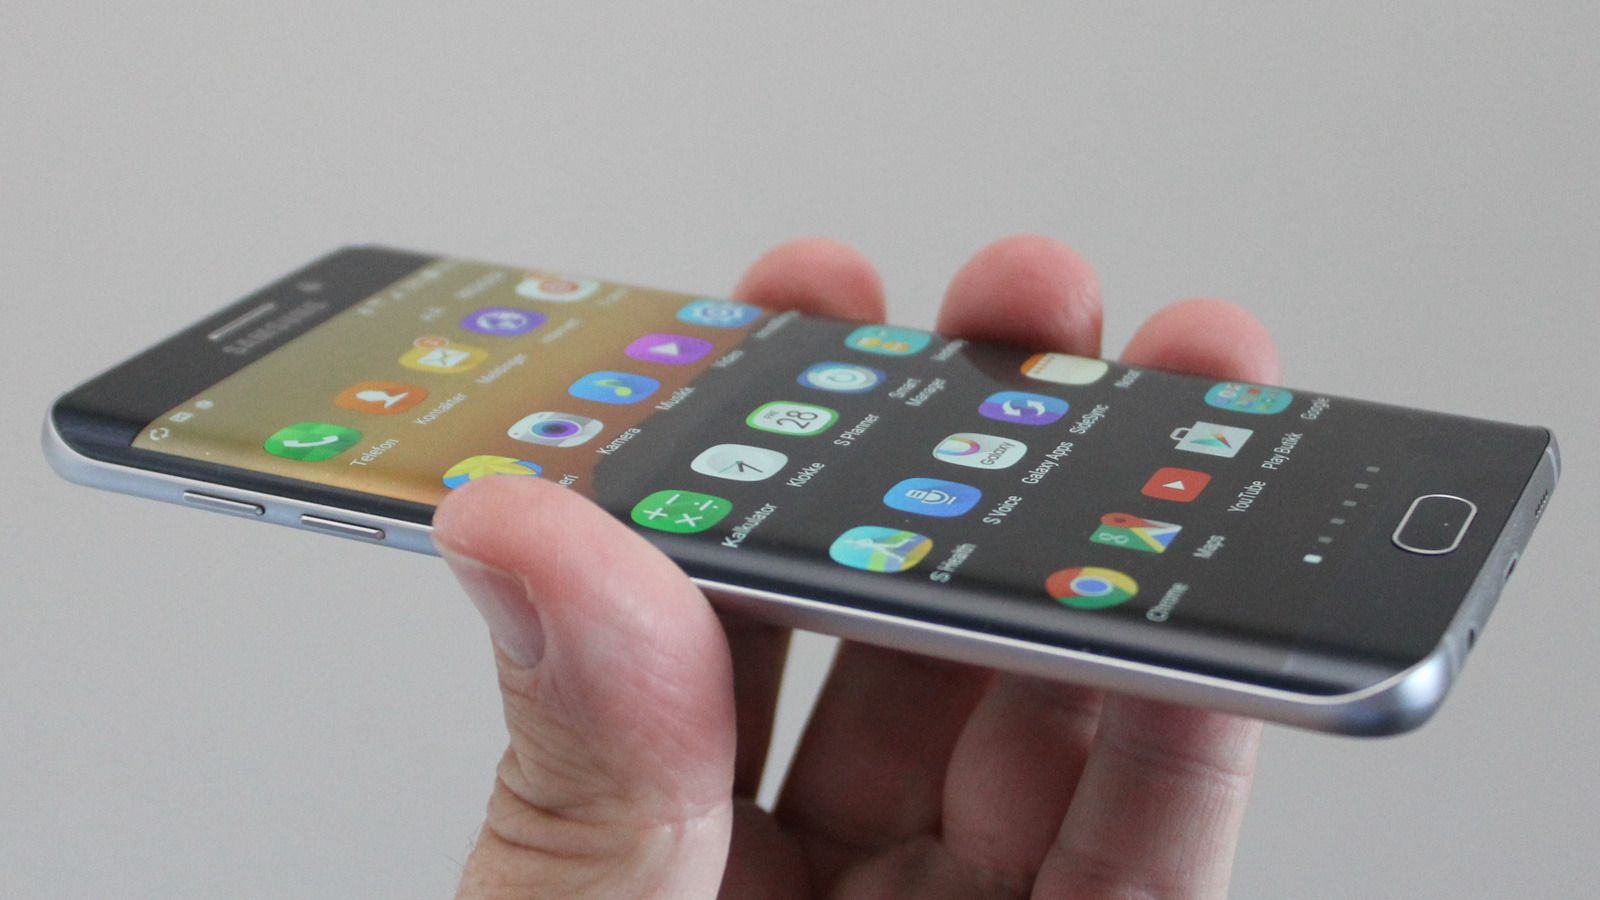 Samsung Galaxy S6 Edge+. Foto: Espen Irwing Swang, Tek.no